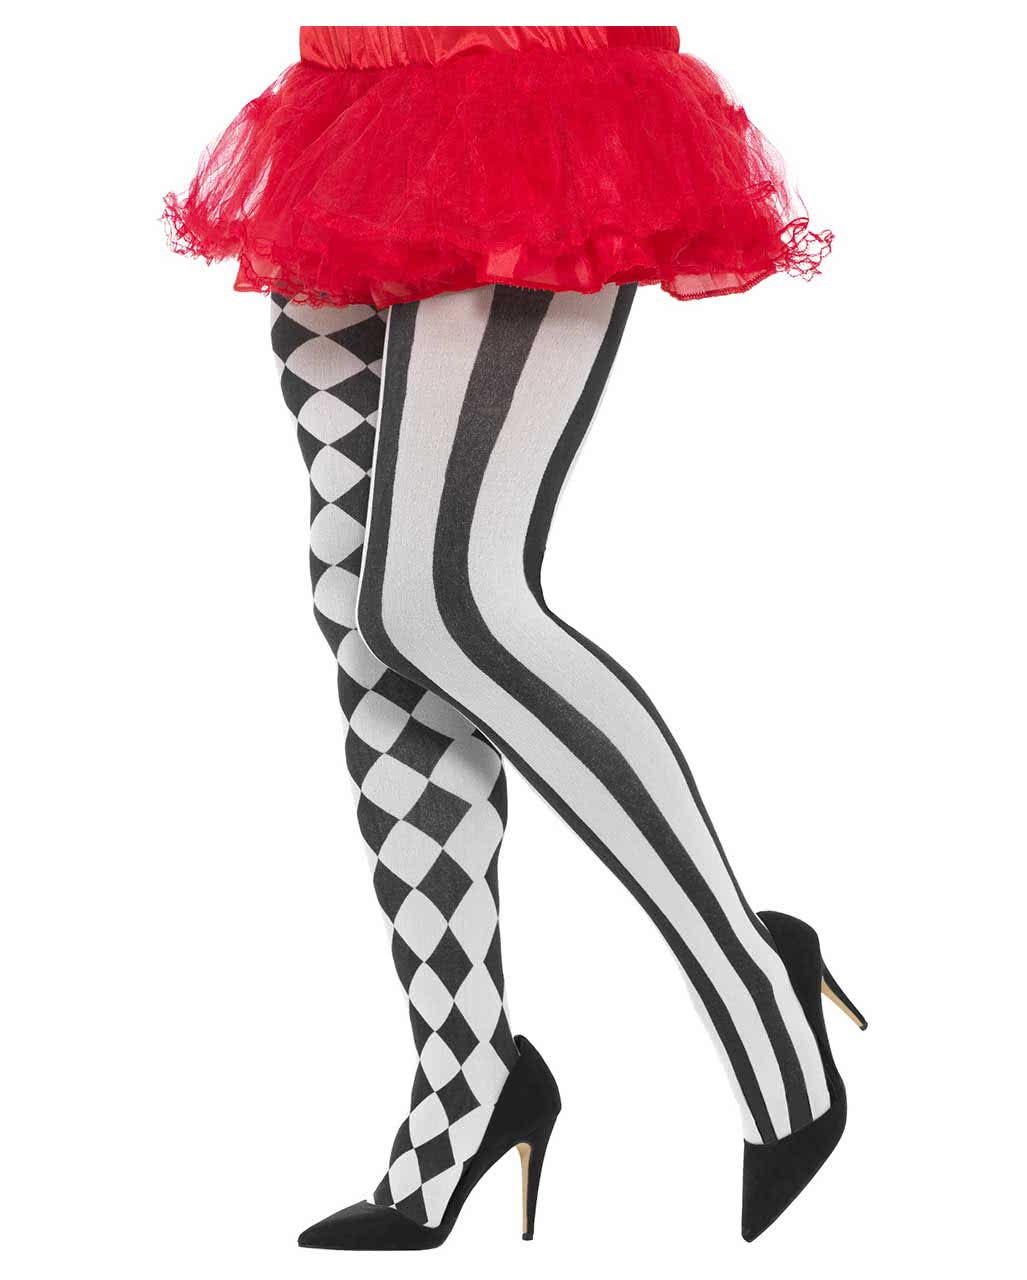 480262aa520b0 Harlequin pantyhose economy Plus Size ◇ Cosplay | horror-shop.com